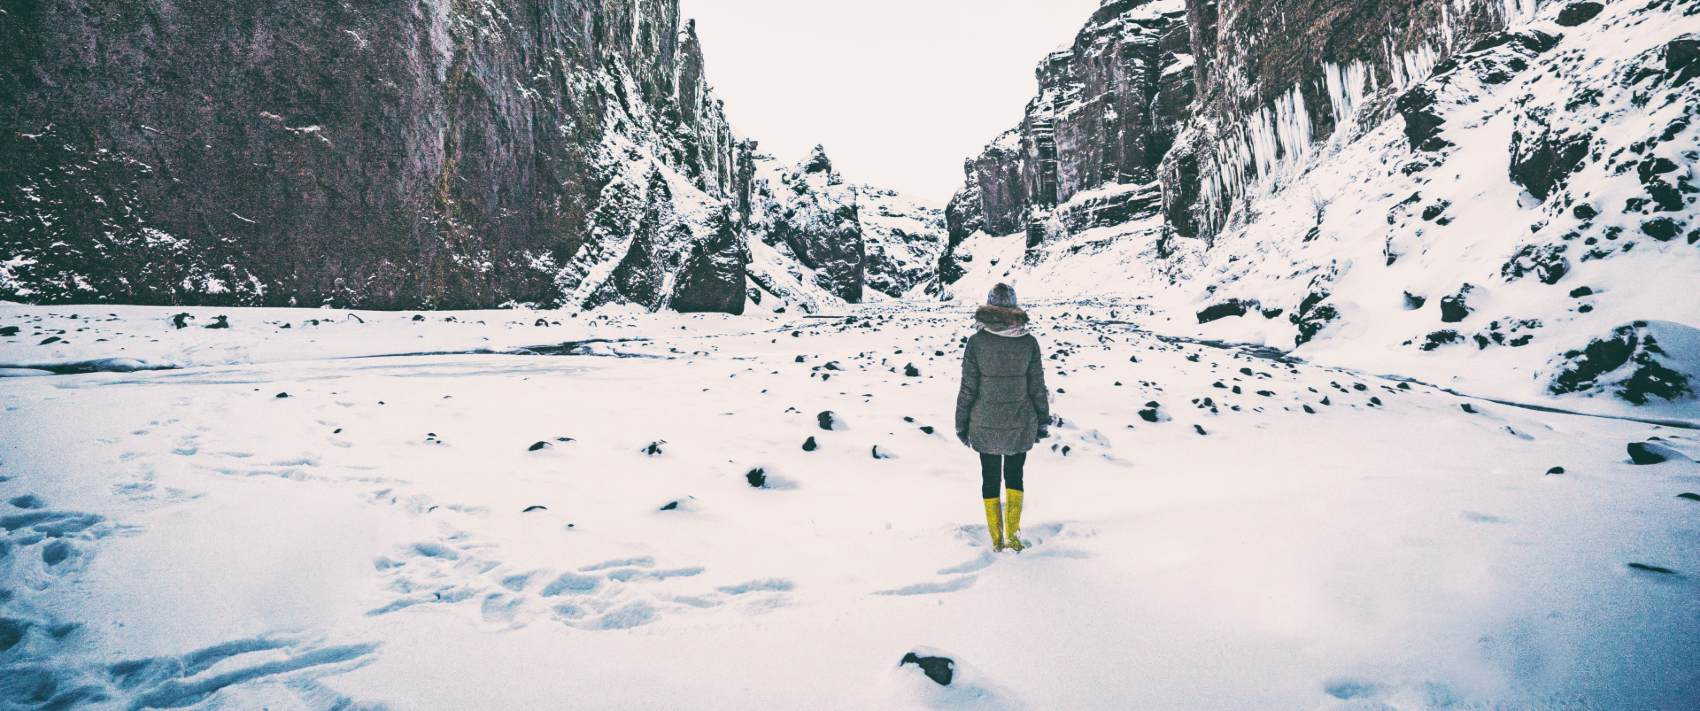 crisis response nurse trekking in the snow to get to work